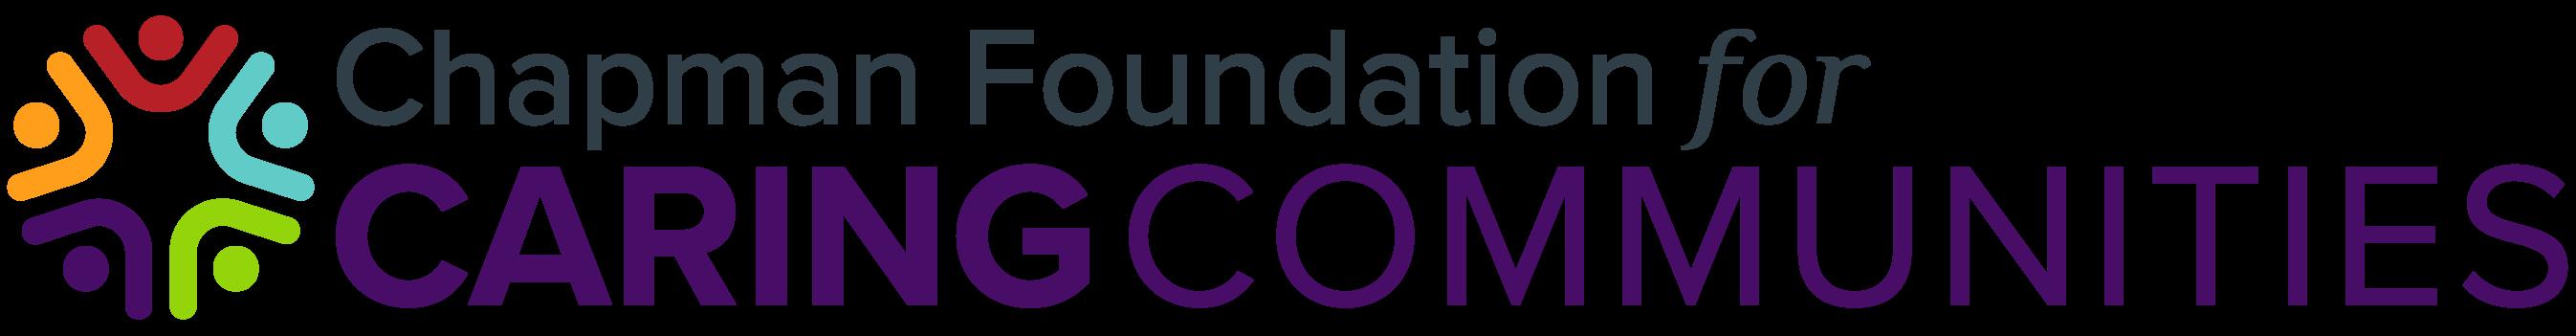 Chapman Foundation for Caring Communities Logo